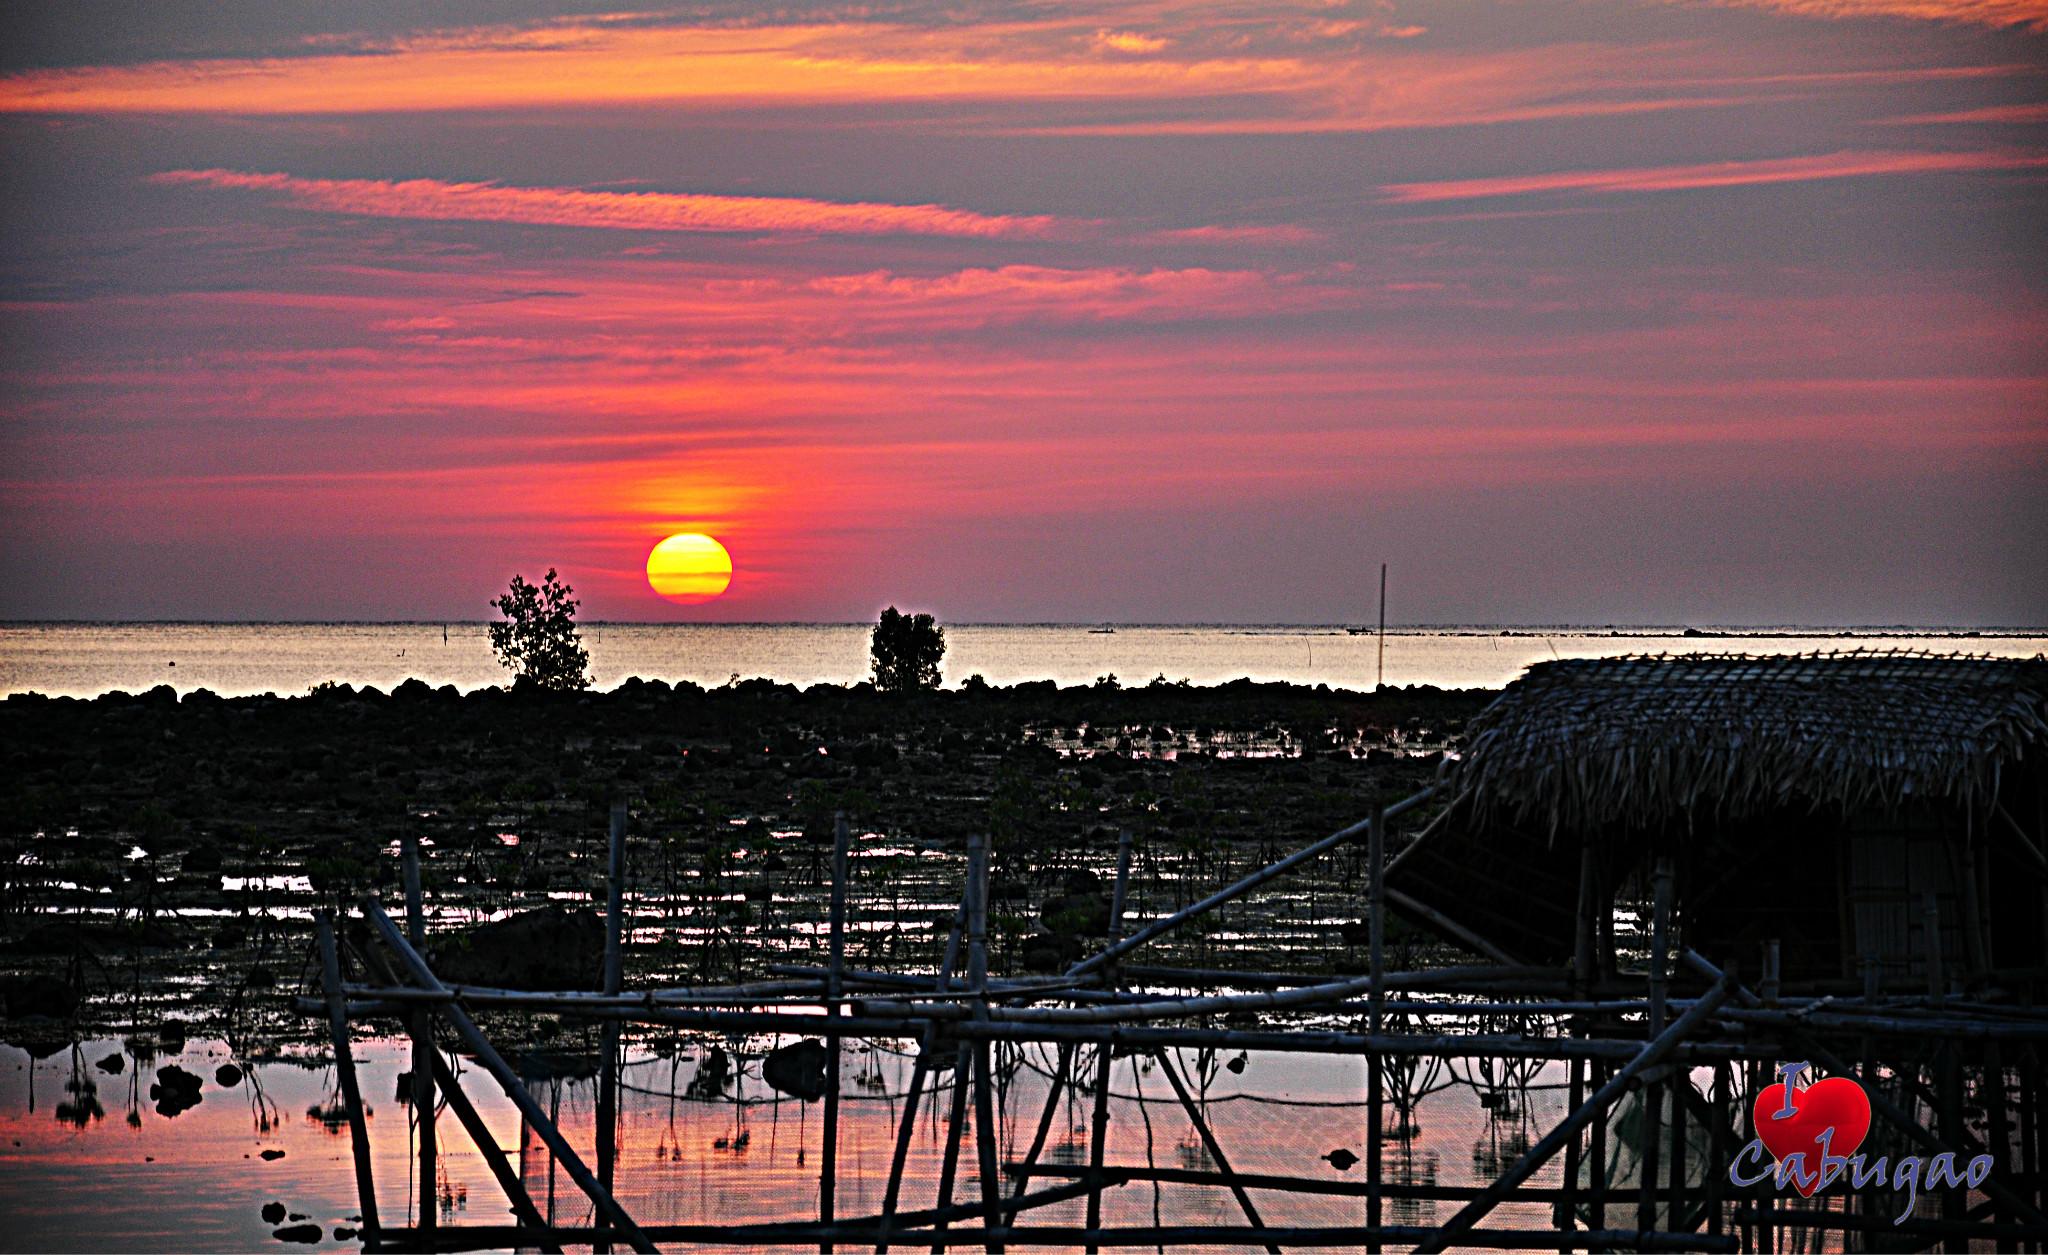 Photo: Brgy. Dardarat Sunset   Brgy. Dardarat, Cabugao, Ilocos Sur   AB Photography